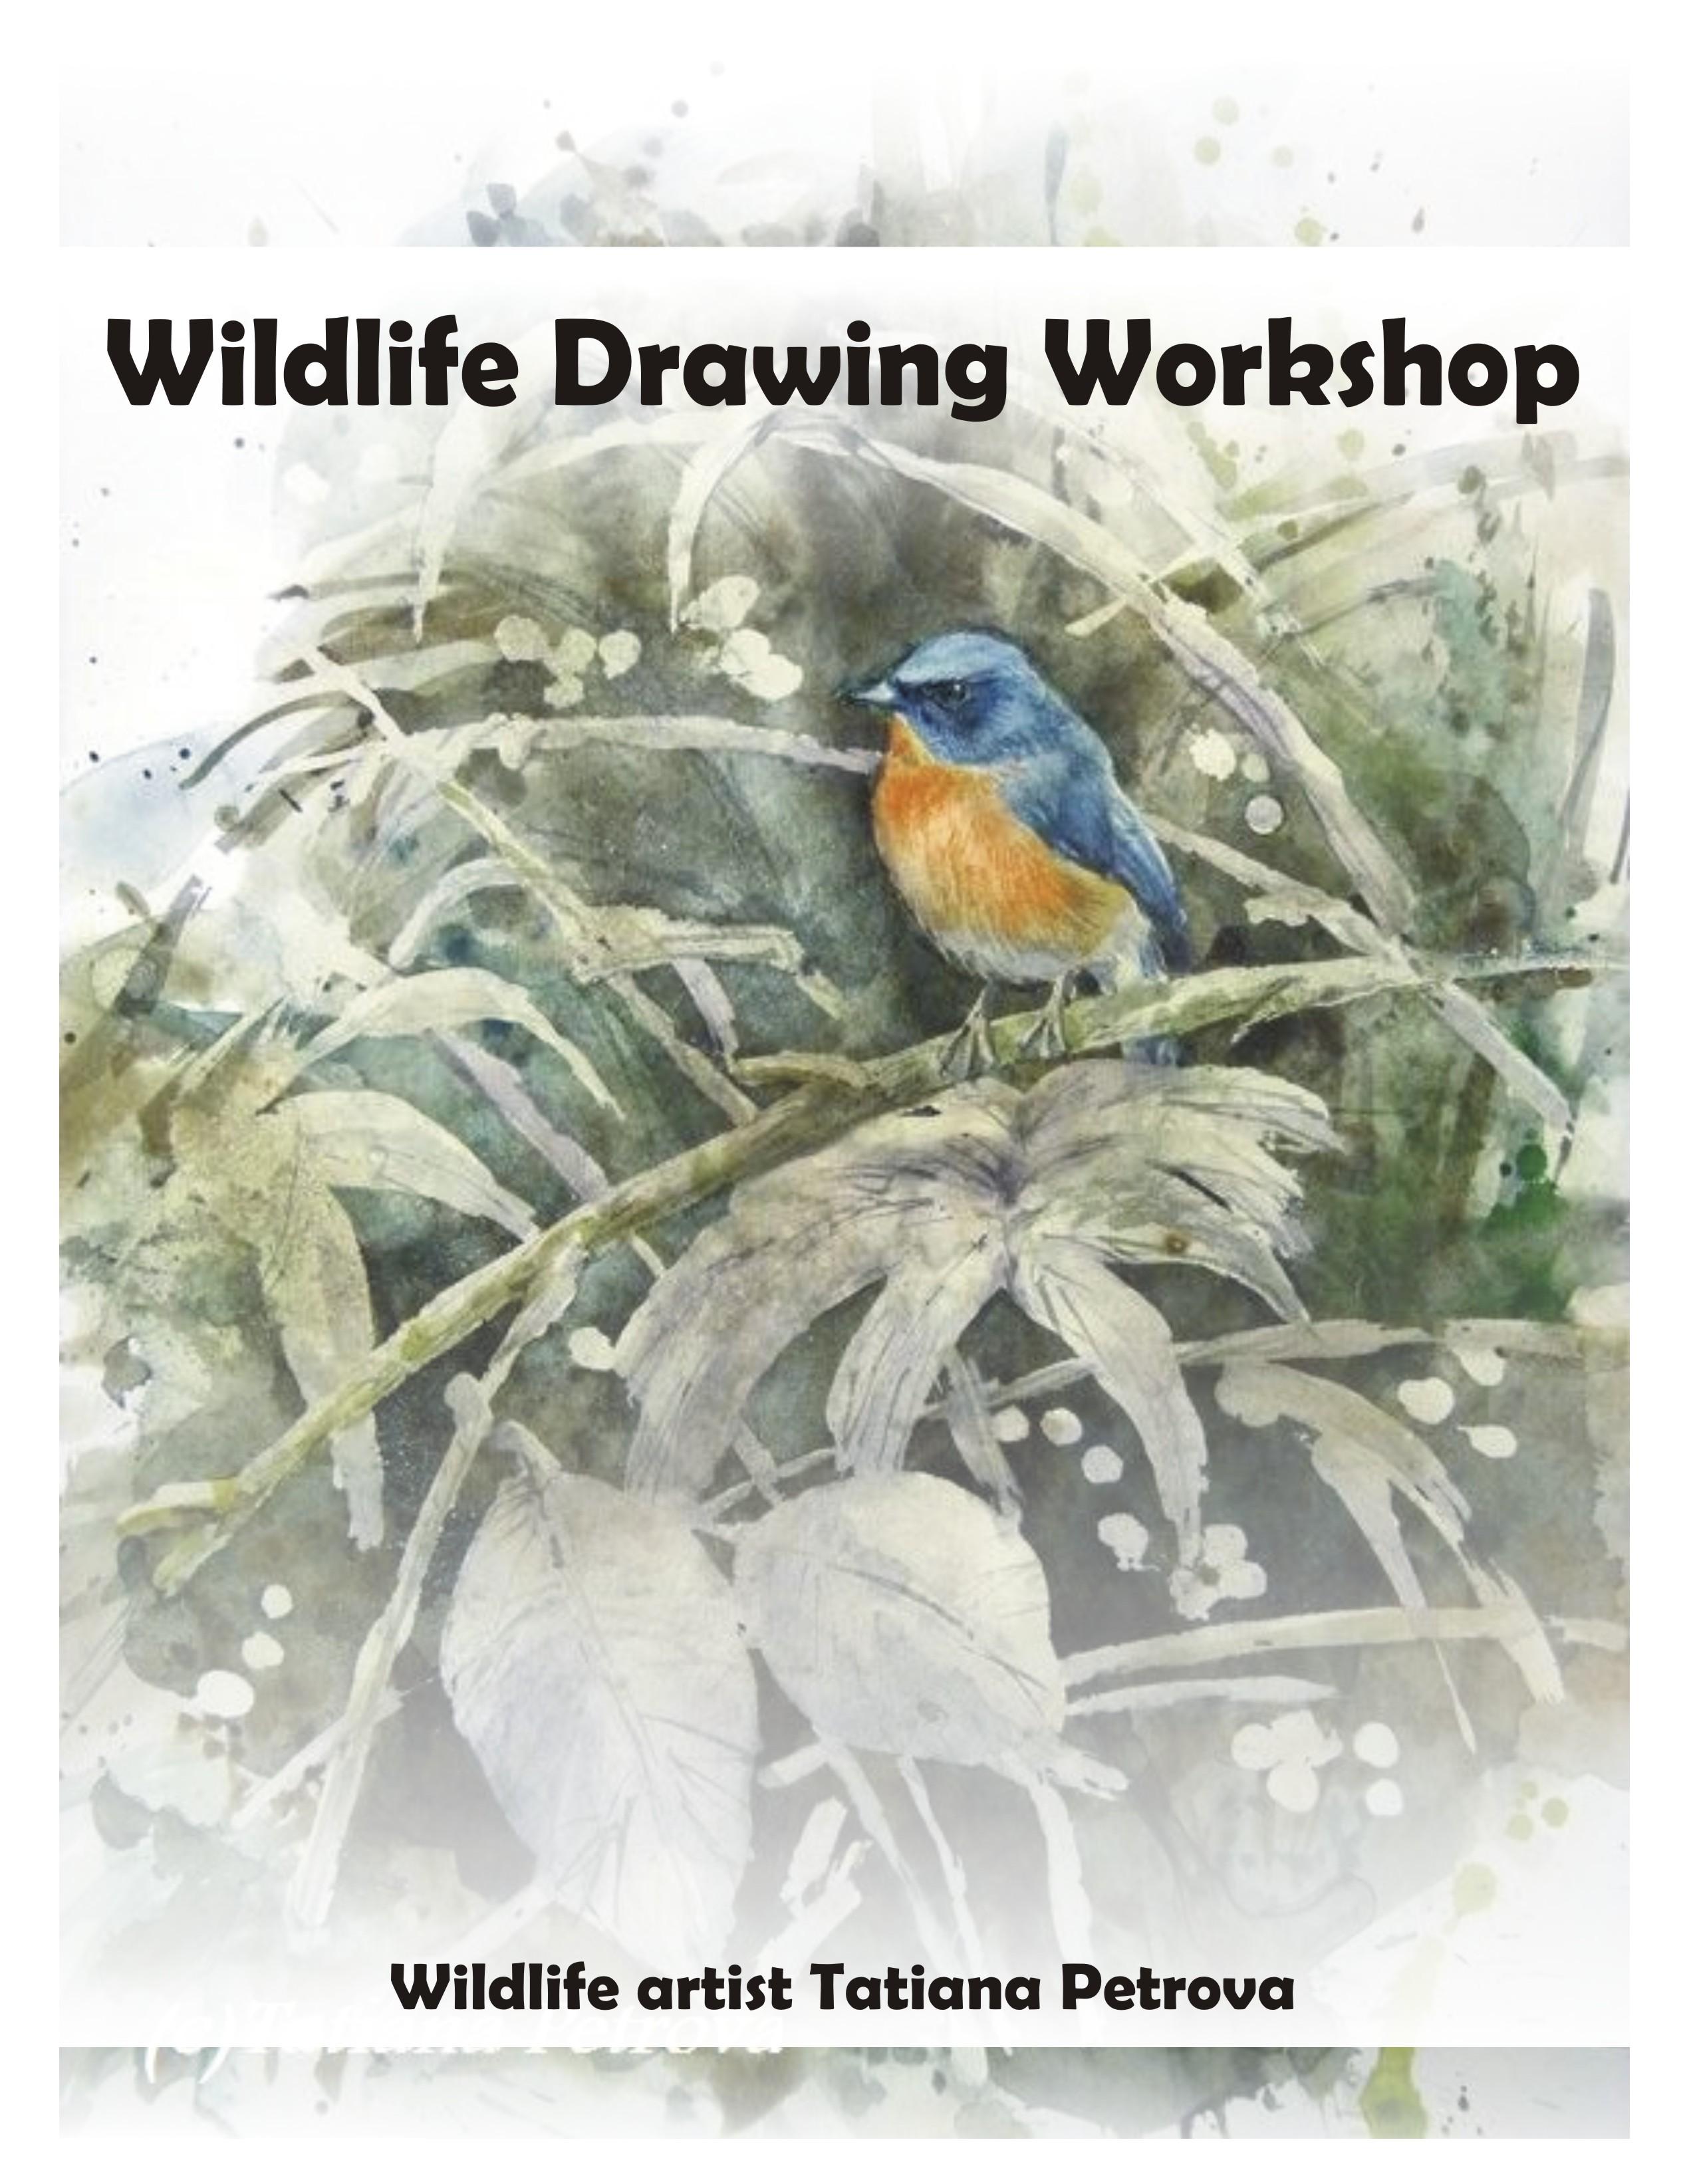 Wildlife Art Workshop by Tatiana Petrova